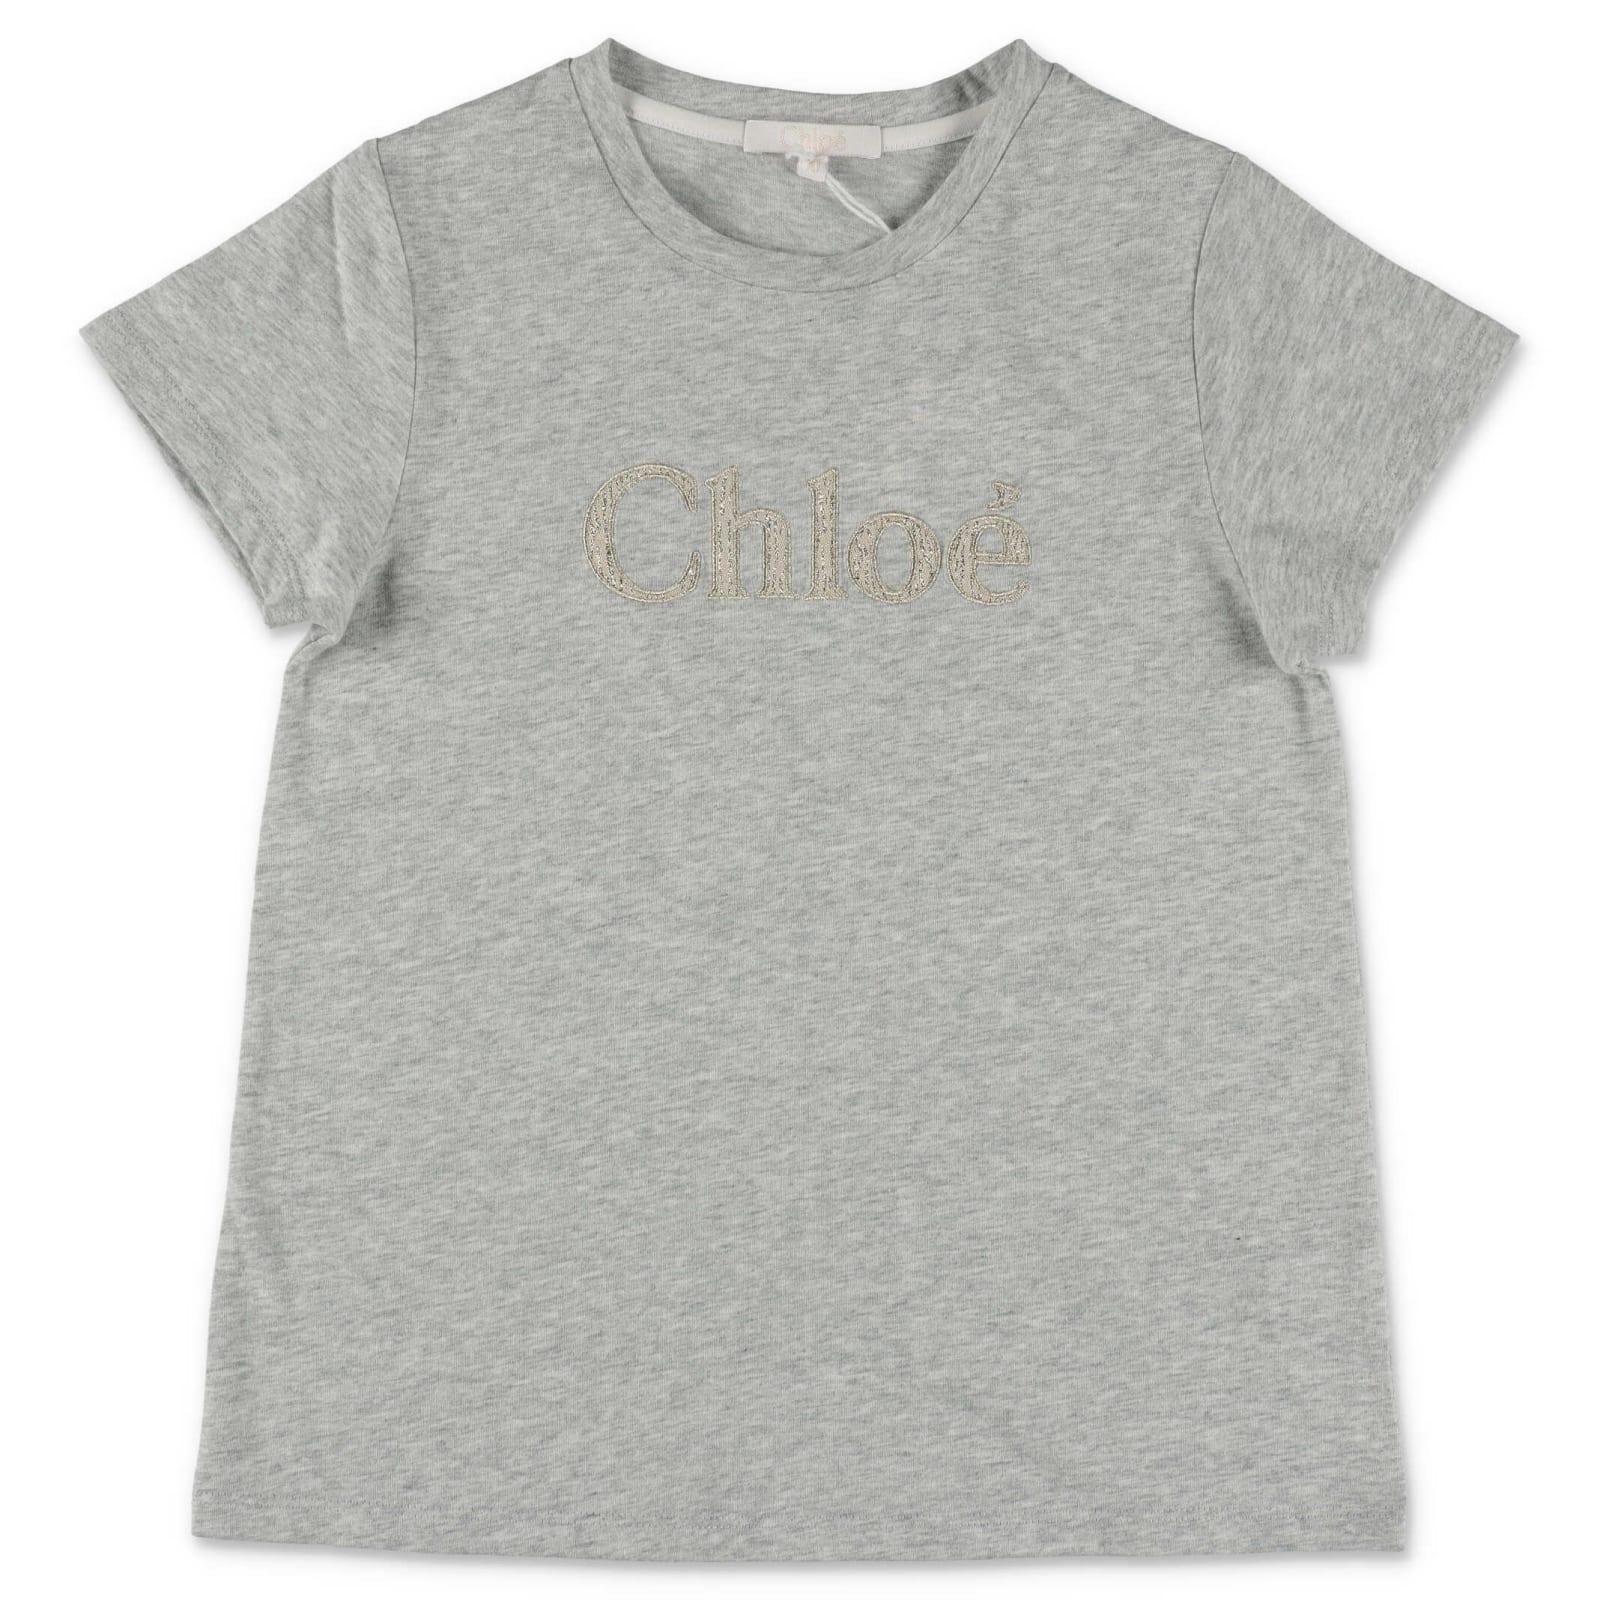 Chloé Kids' T-shirt In Grigio